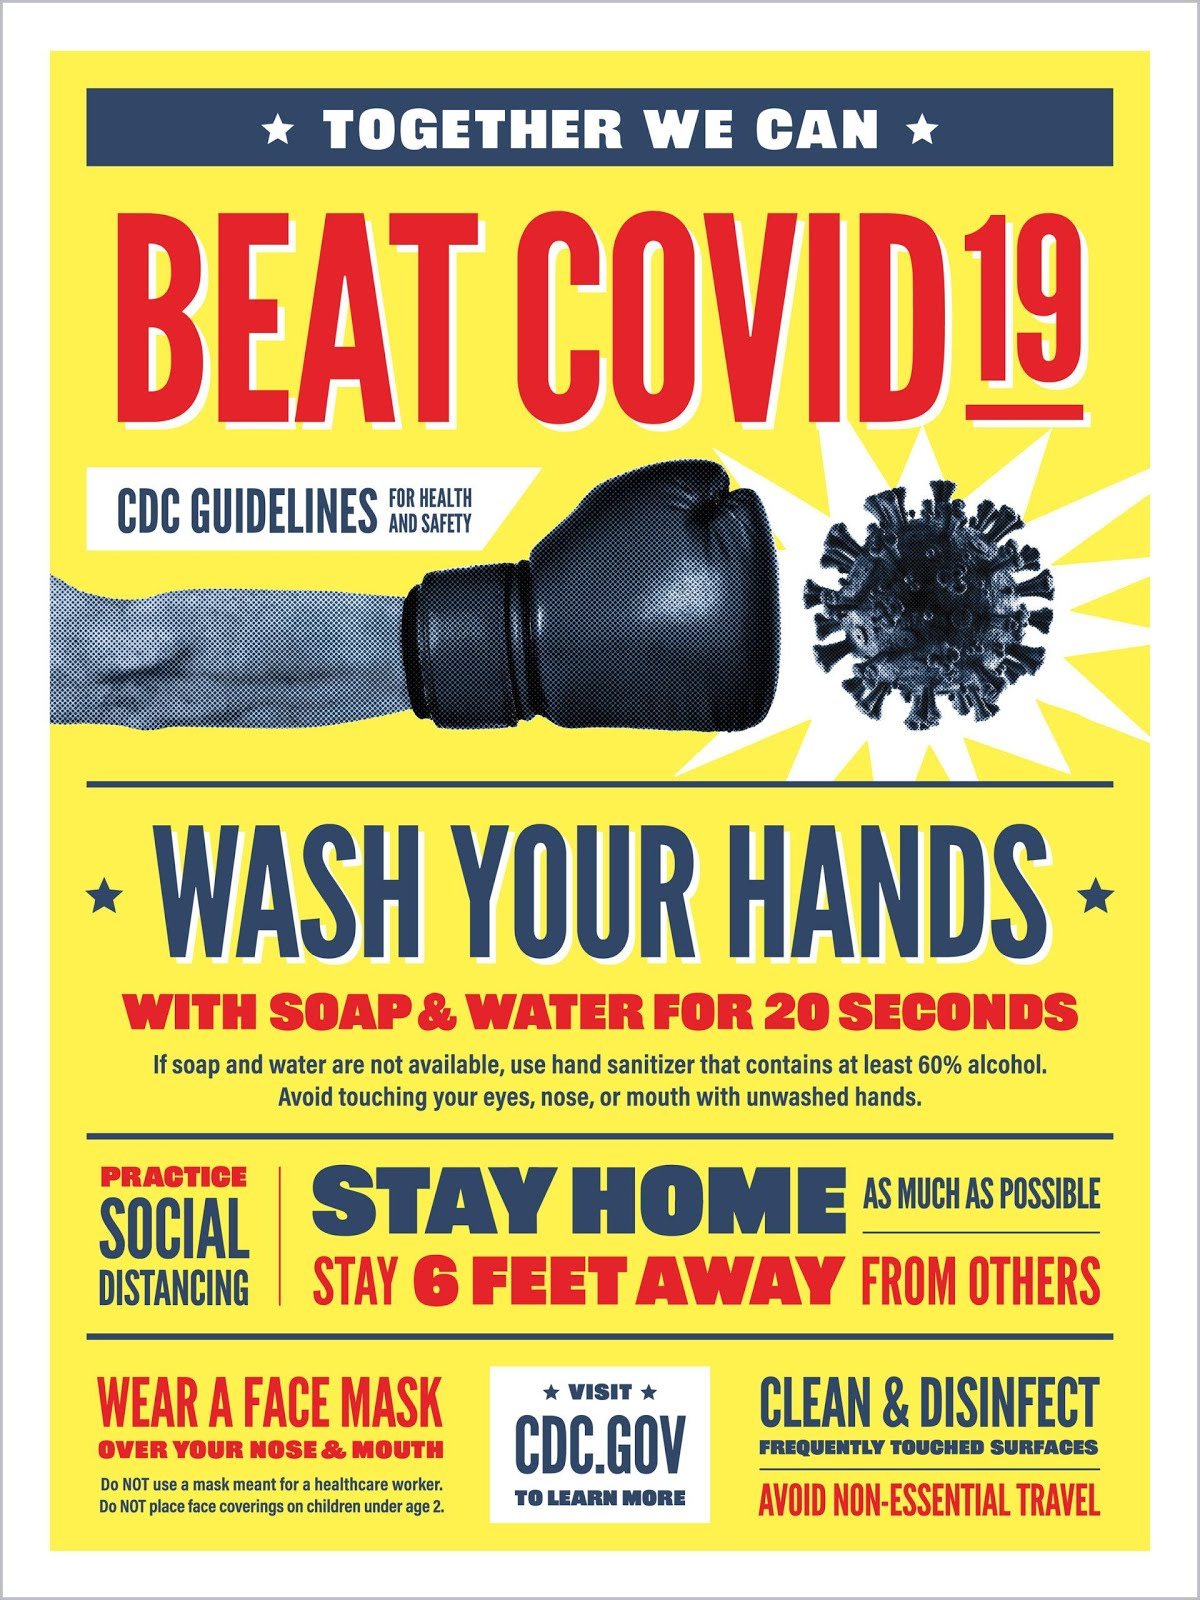 BEAT COVID-19